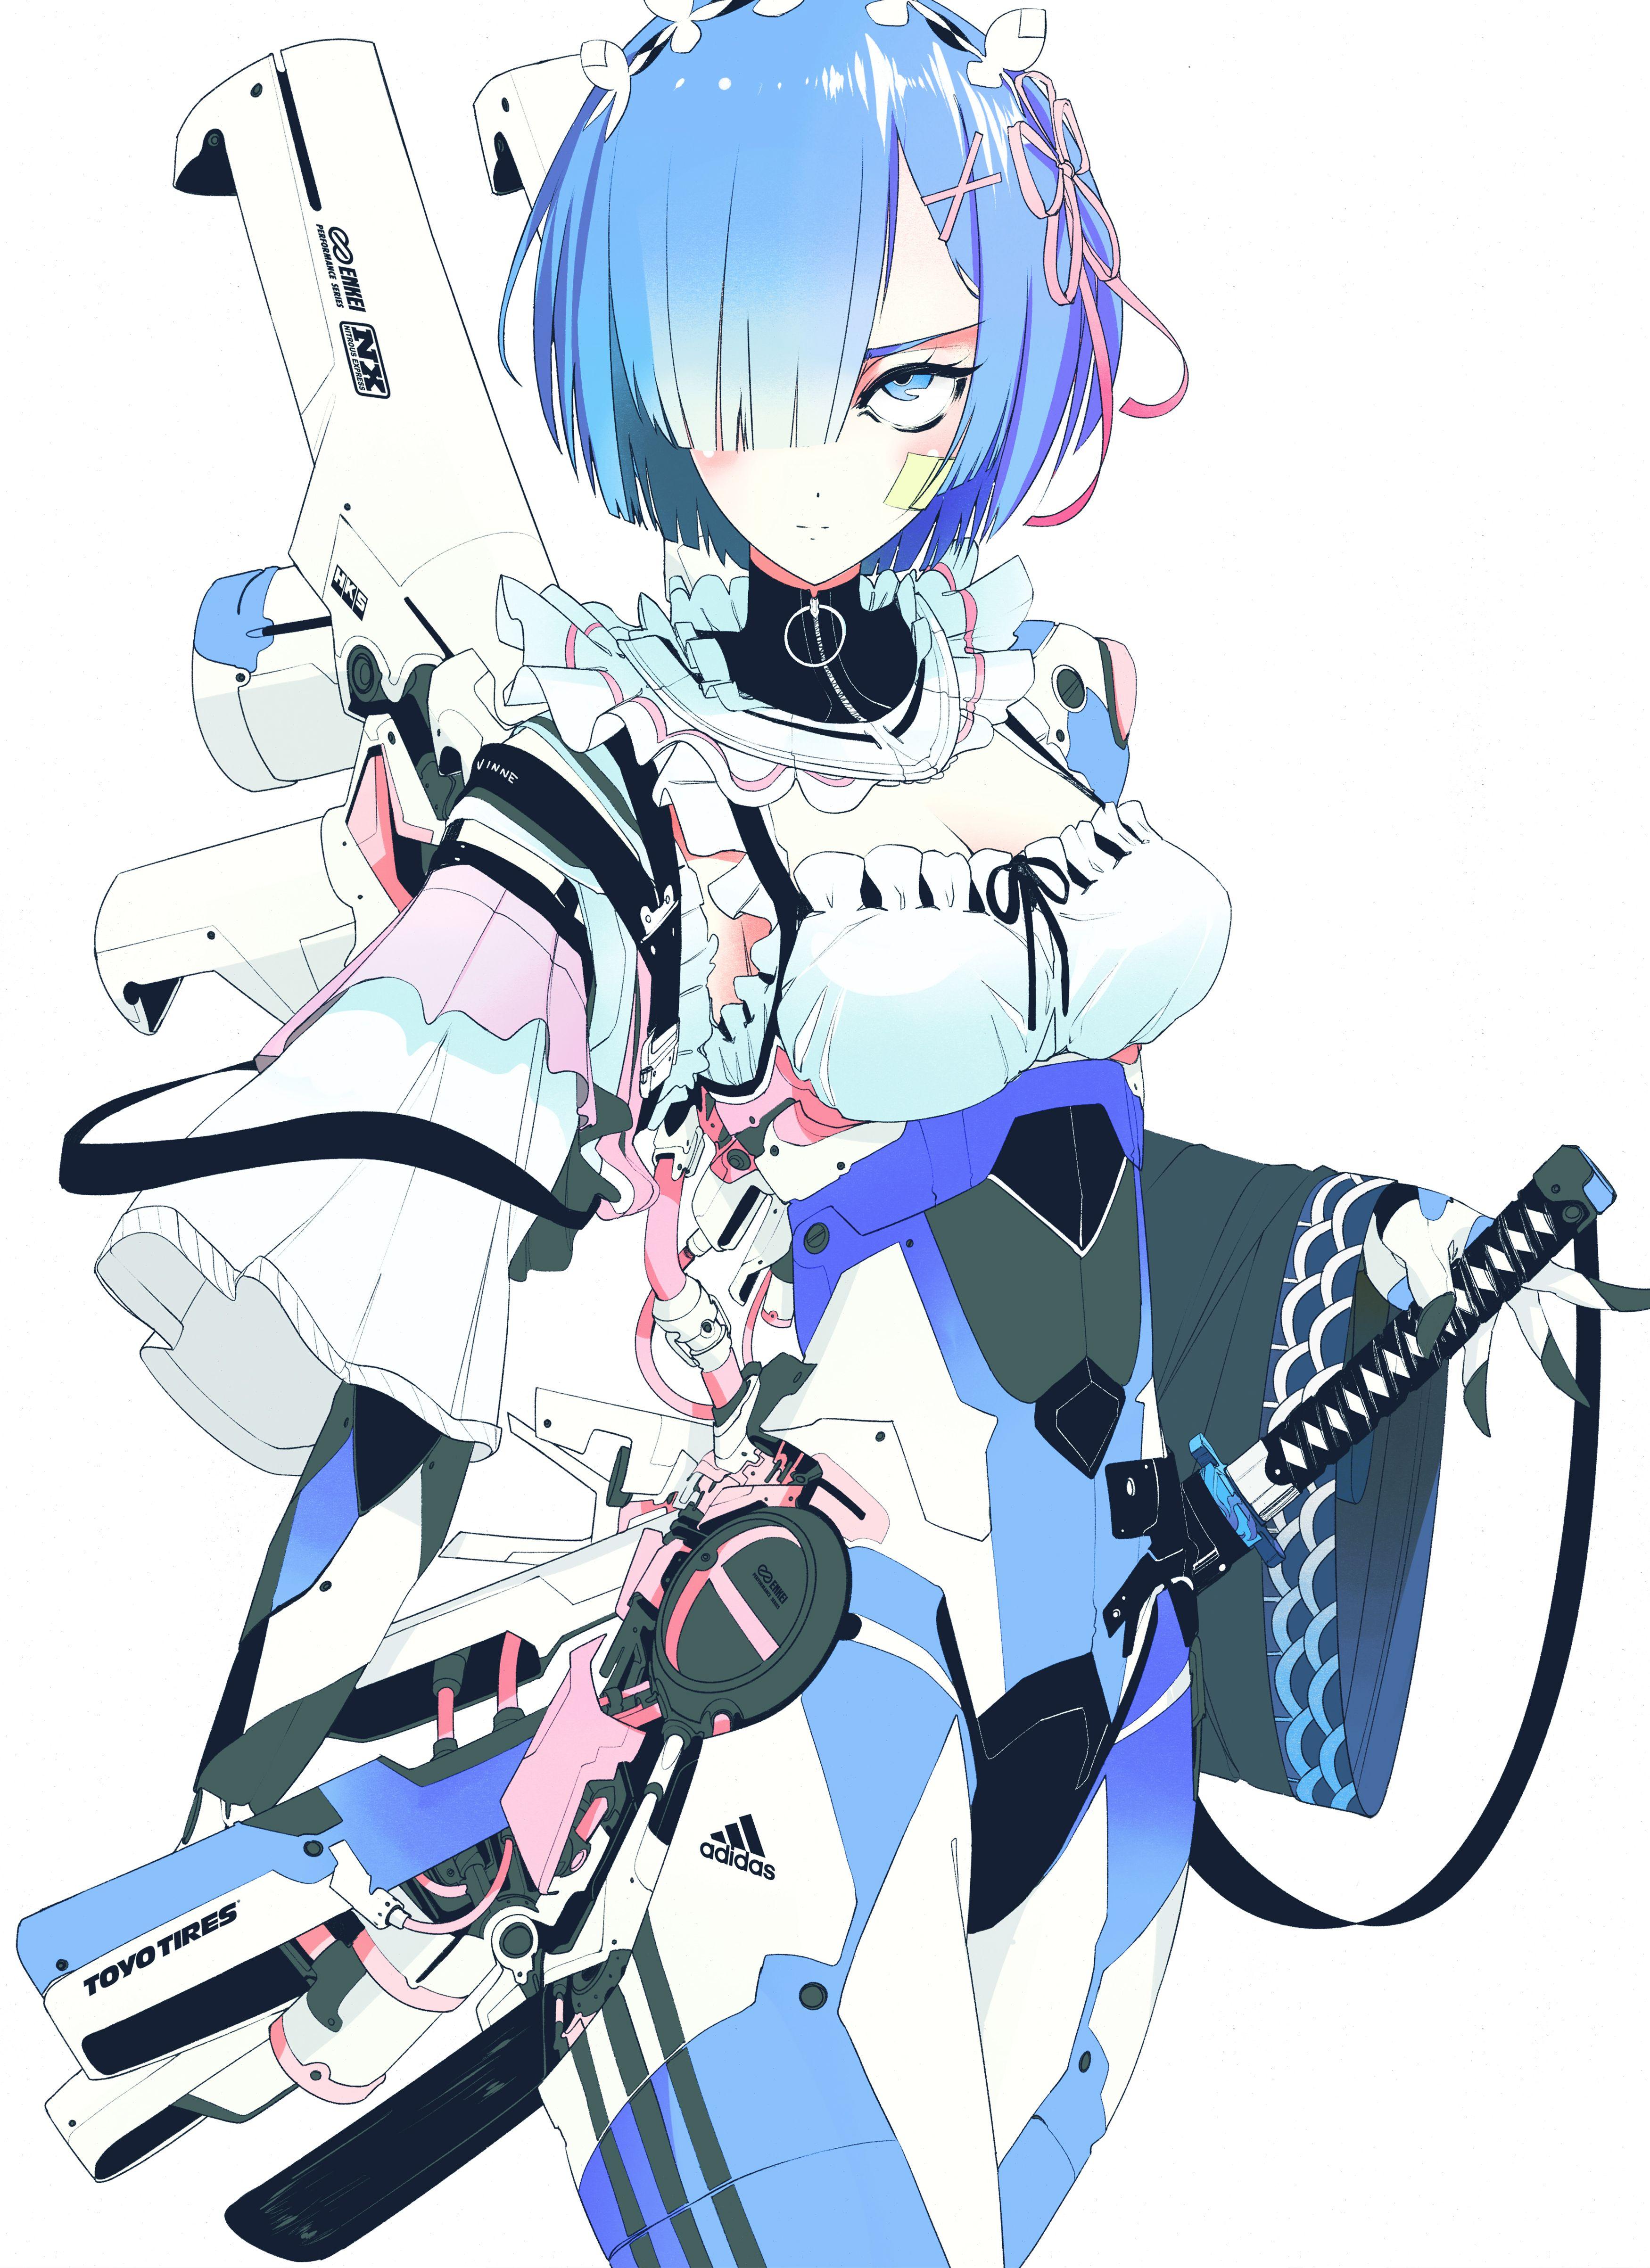 Pin by X e r k r y z a on A n i m e anime